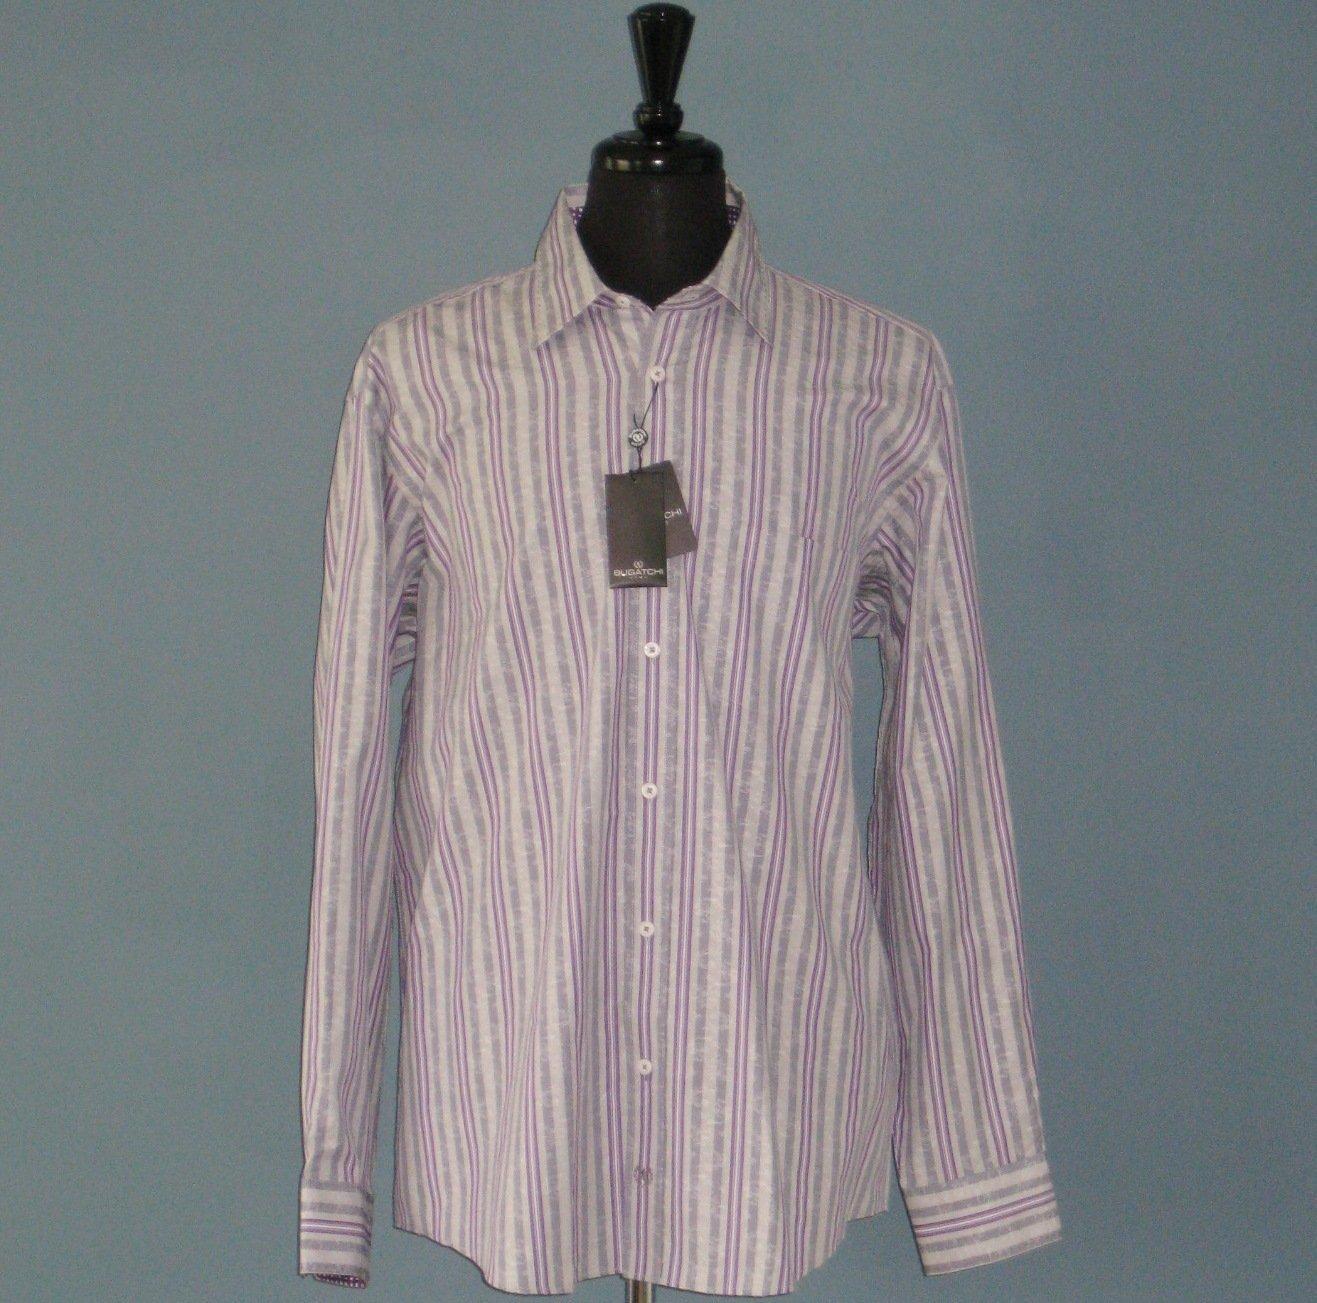 NWT Bugatchi Uomo Violet Striped 100% Cotton Long Sleeve Shirt - XL